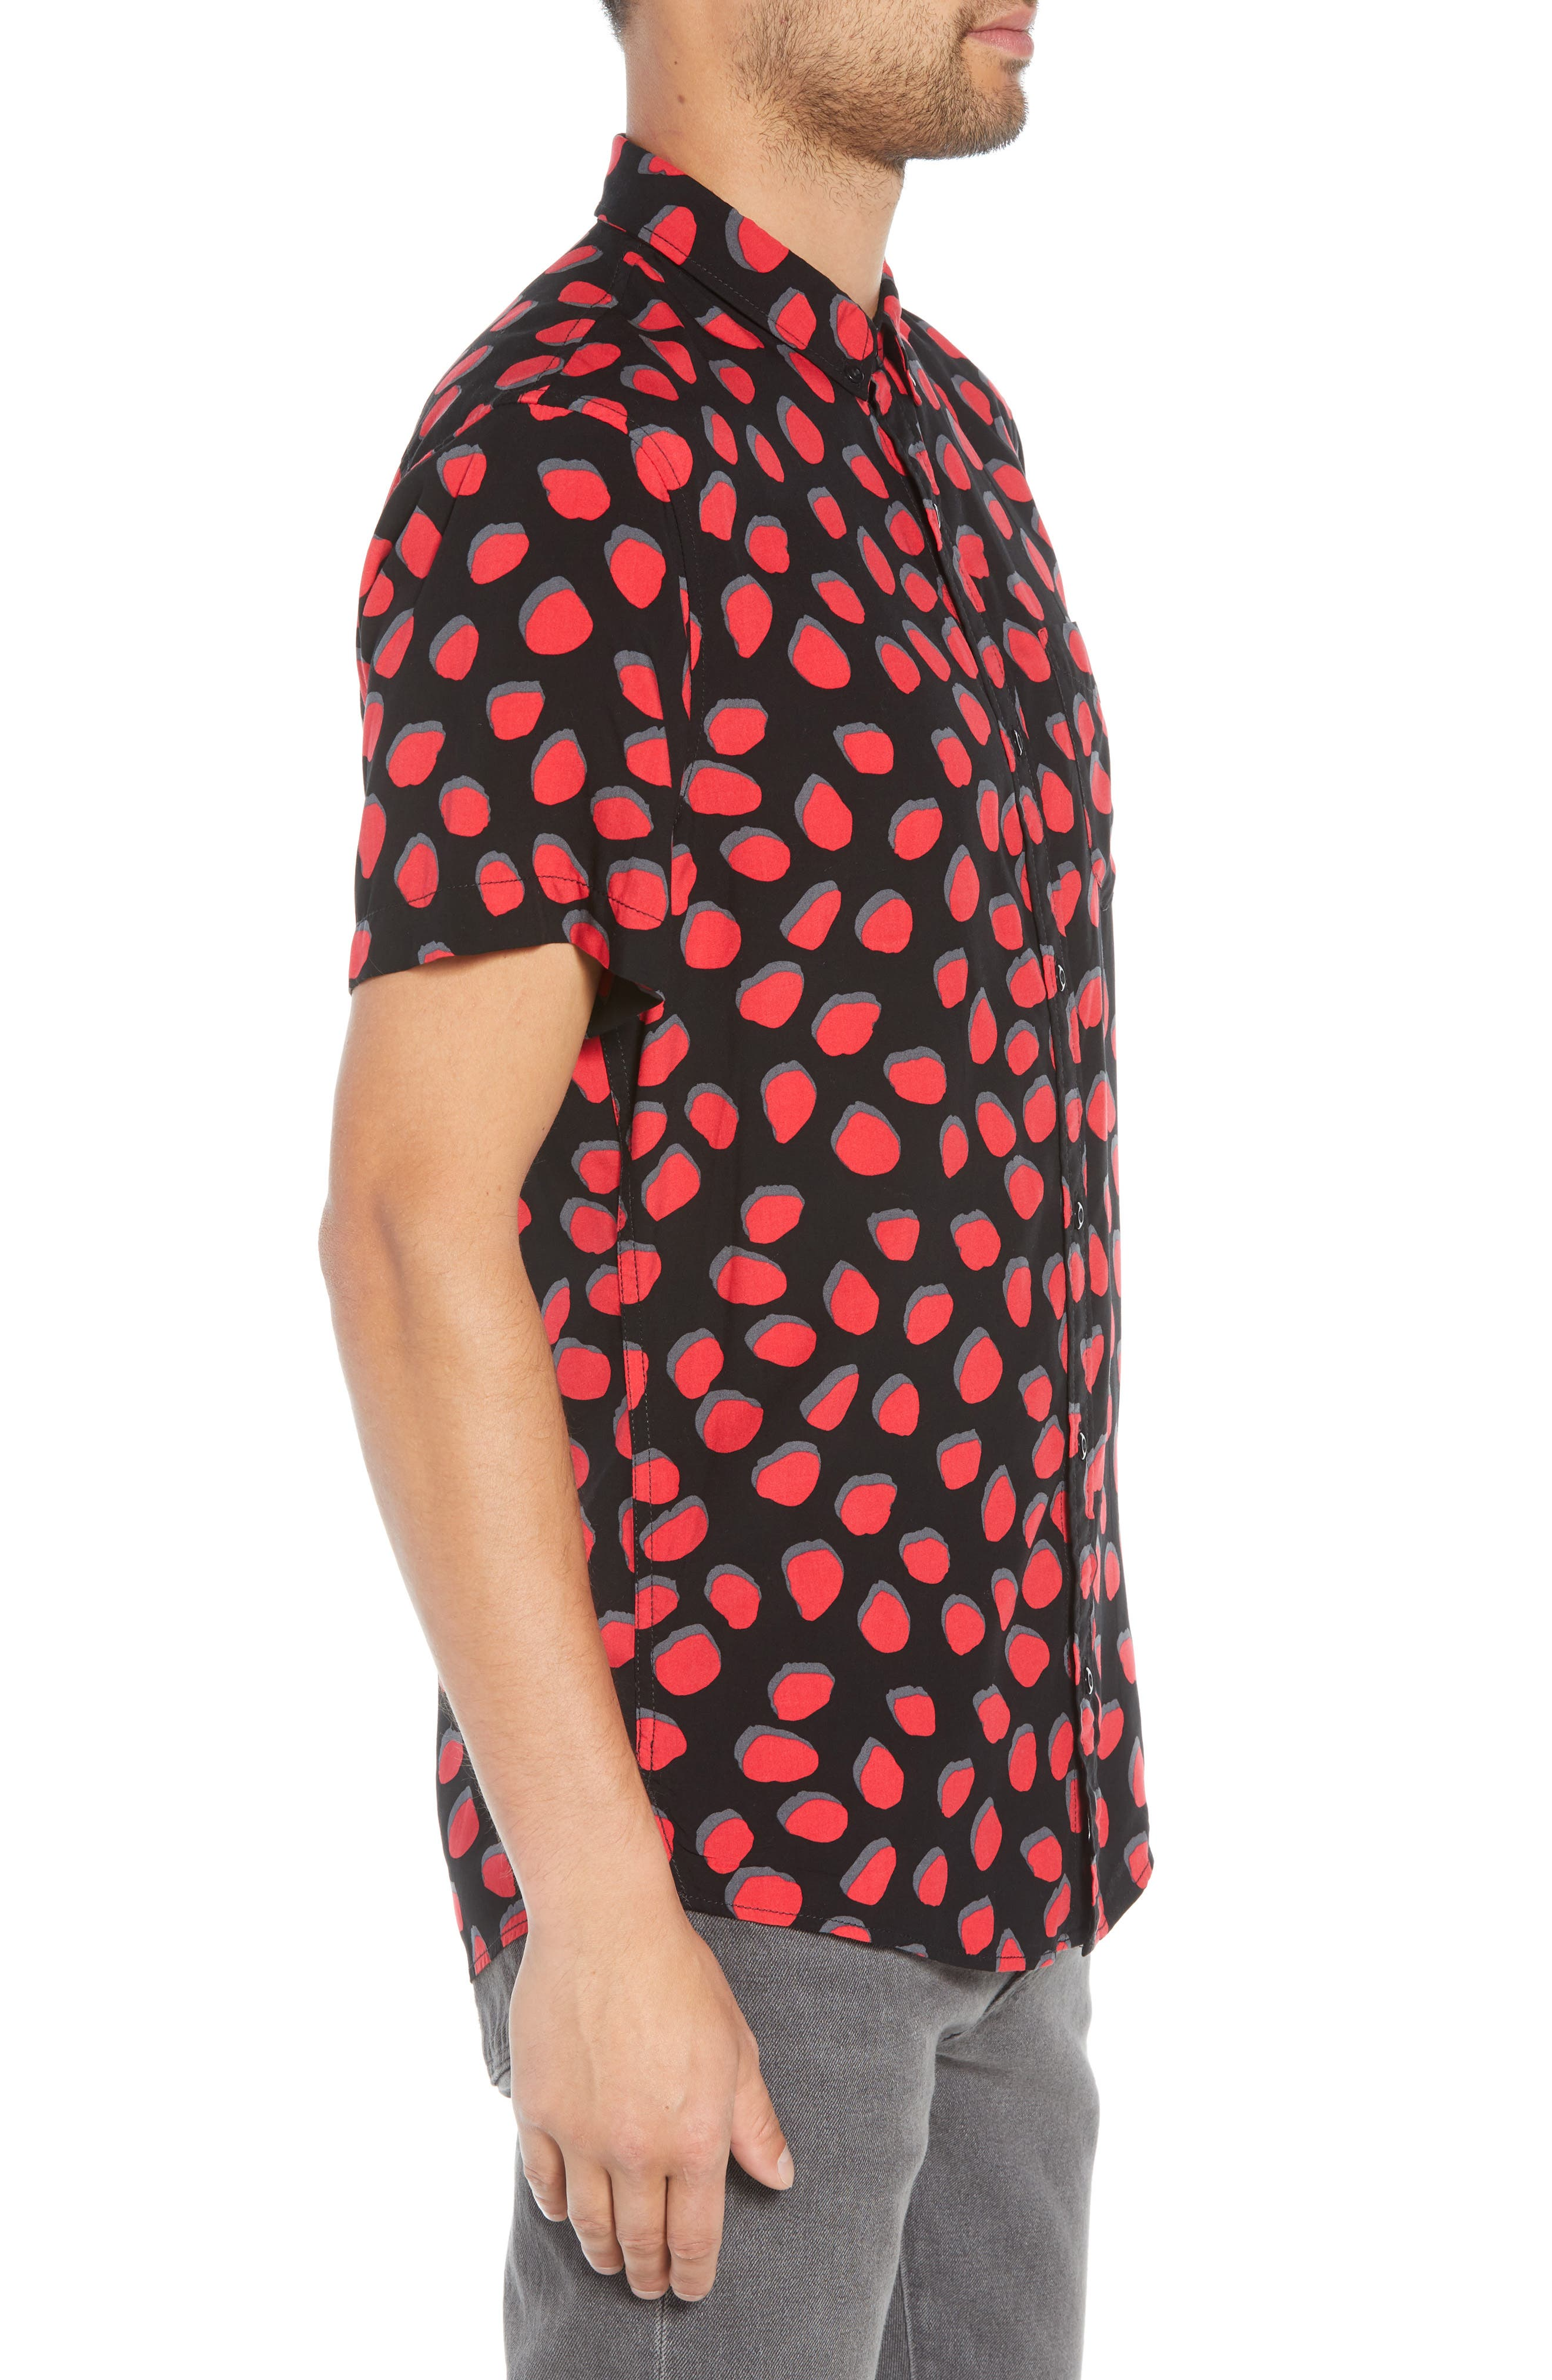 Dot Print Woven Shirt,                             Alternate thumbnail 3, color,                             BLACK CORAL INKY DOTS